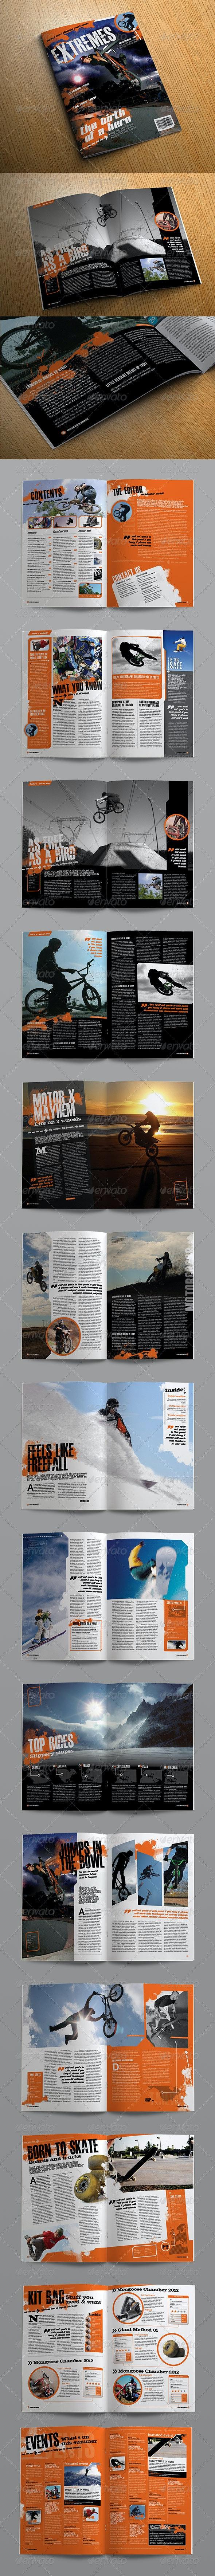 eXtreme Magazine Template - Magazines Print Templates